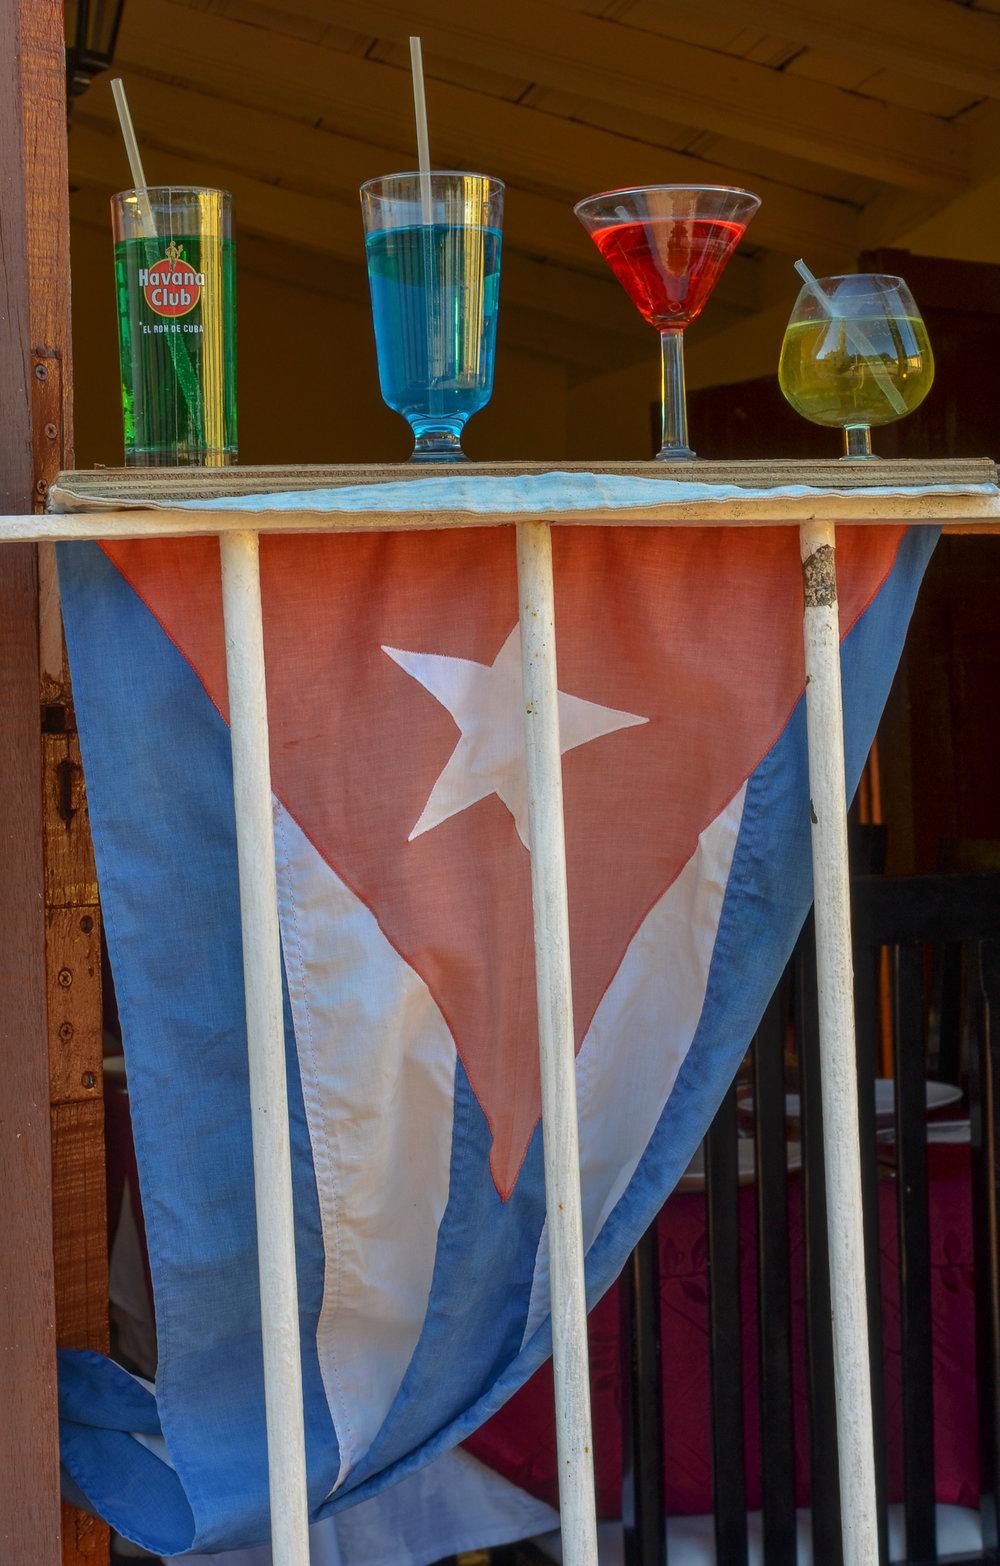 Havana Club Drinks & Cuban Flag - Trinidad Cuba